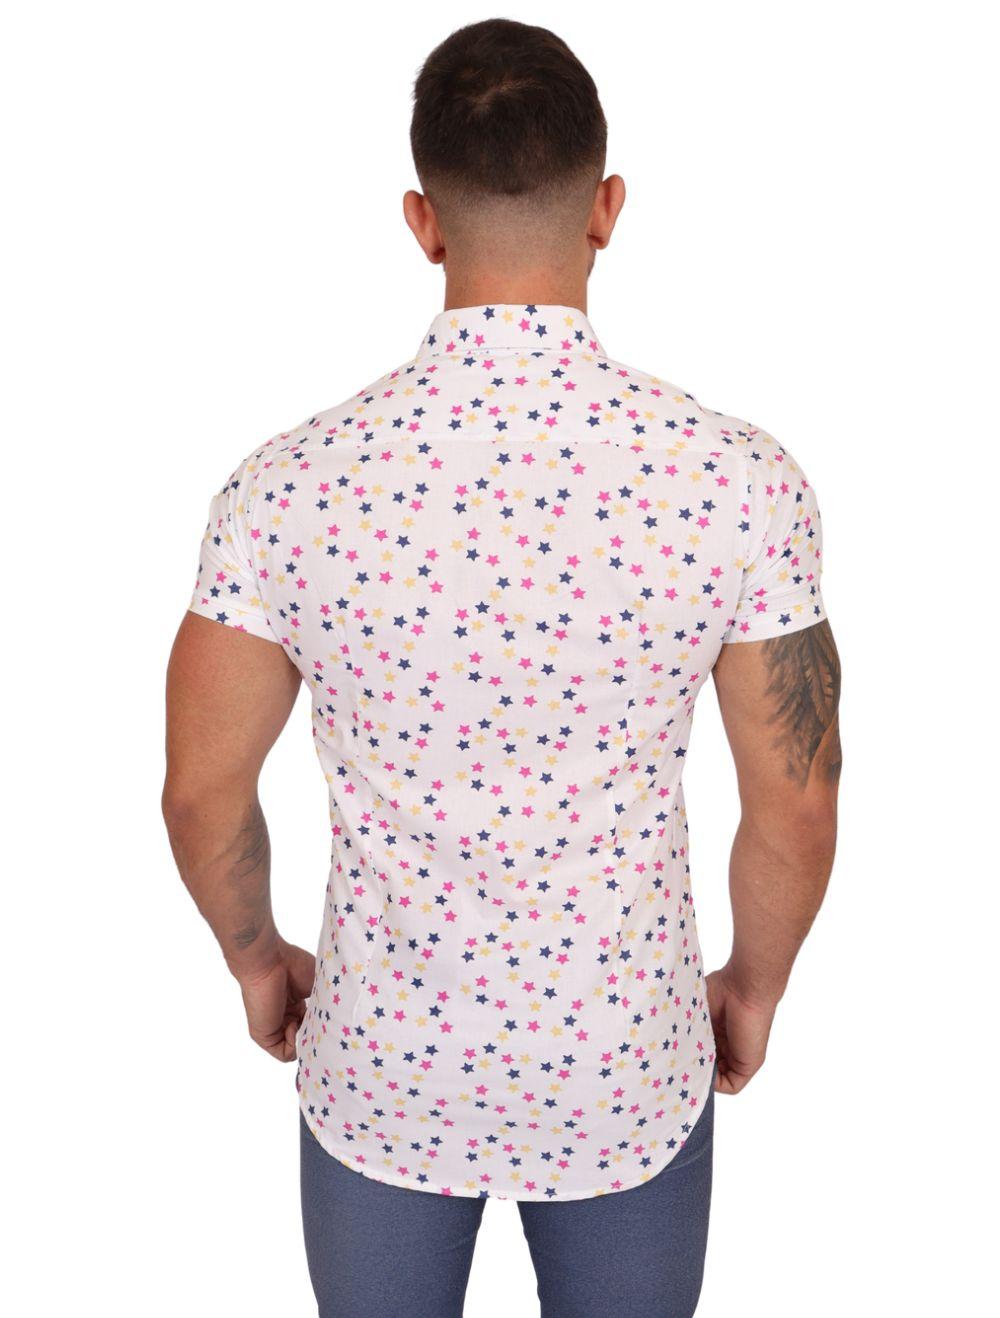 Camisa Masculina Manga Curta Branca Estrelas